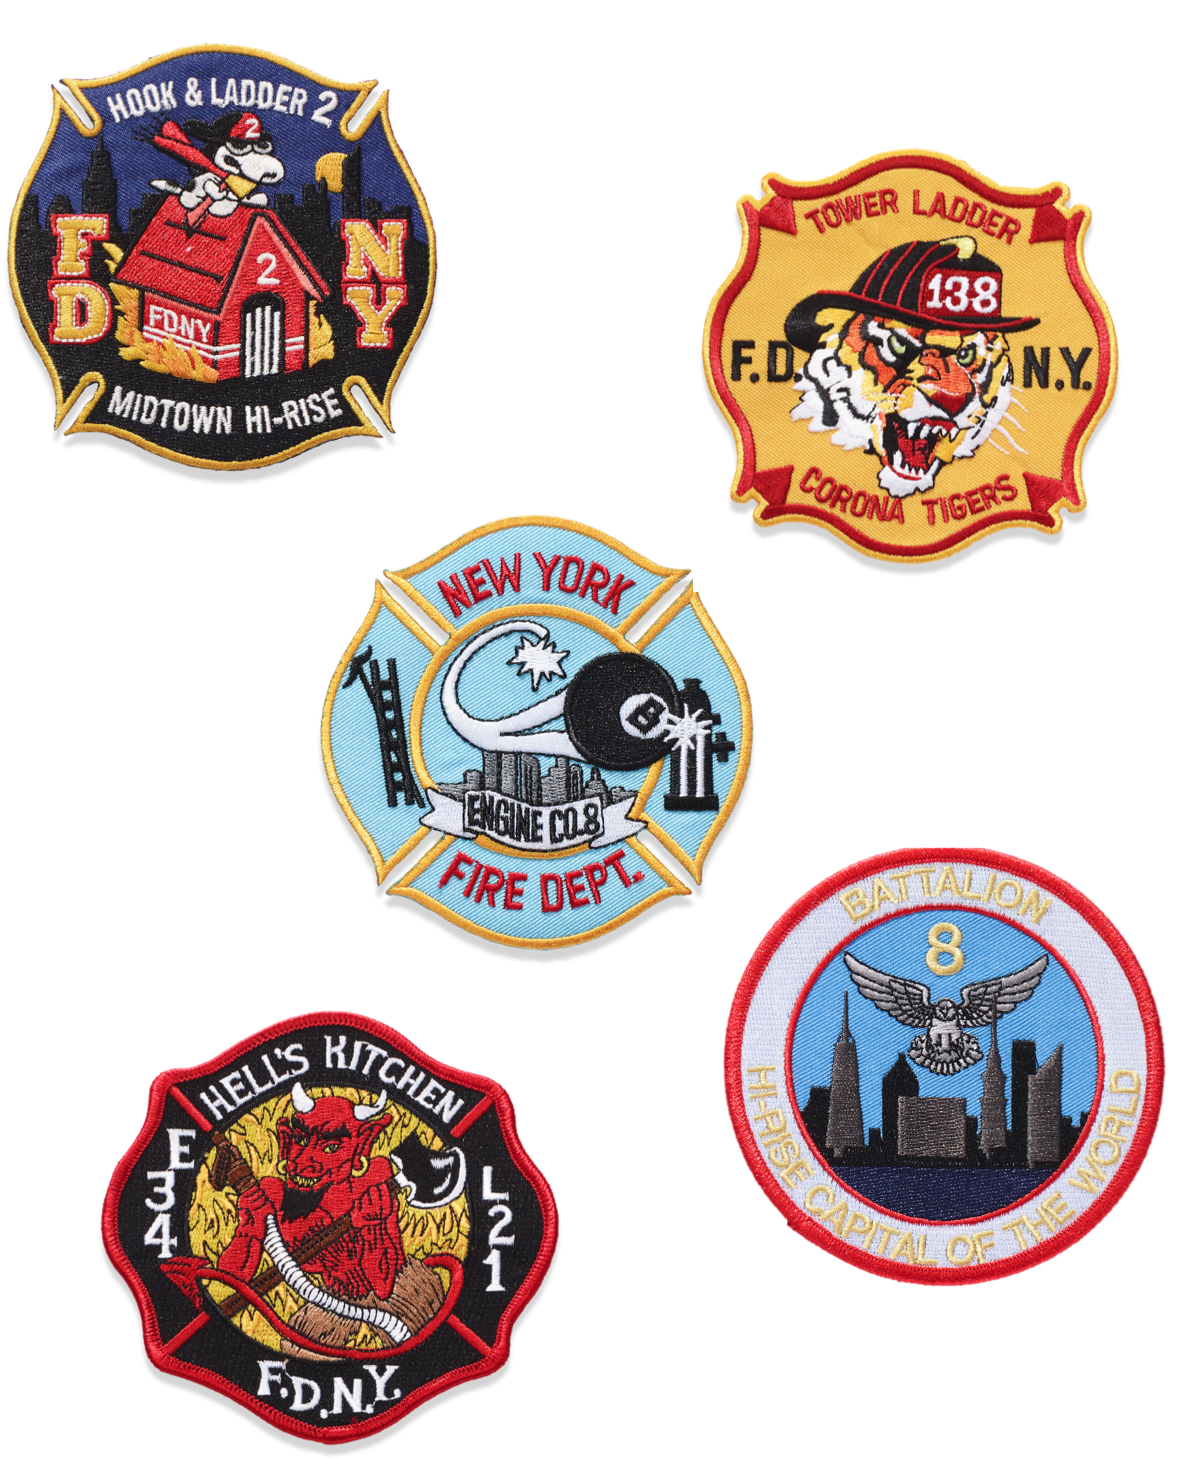 Canada Goose x FDNY – The Bravest Coat Badges